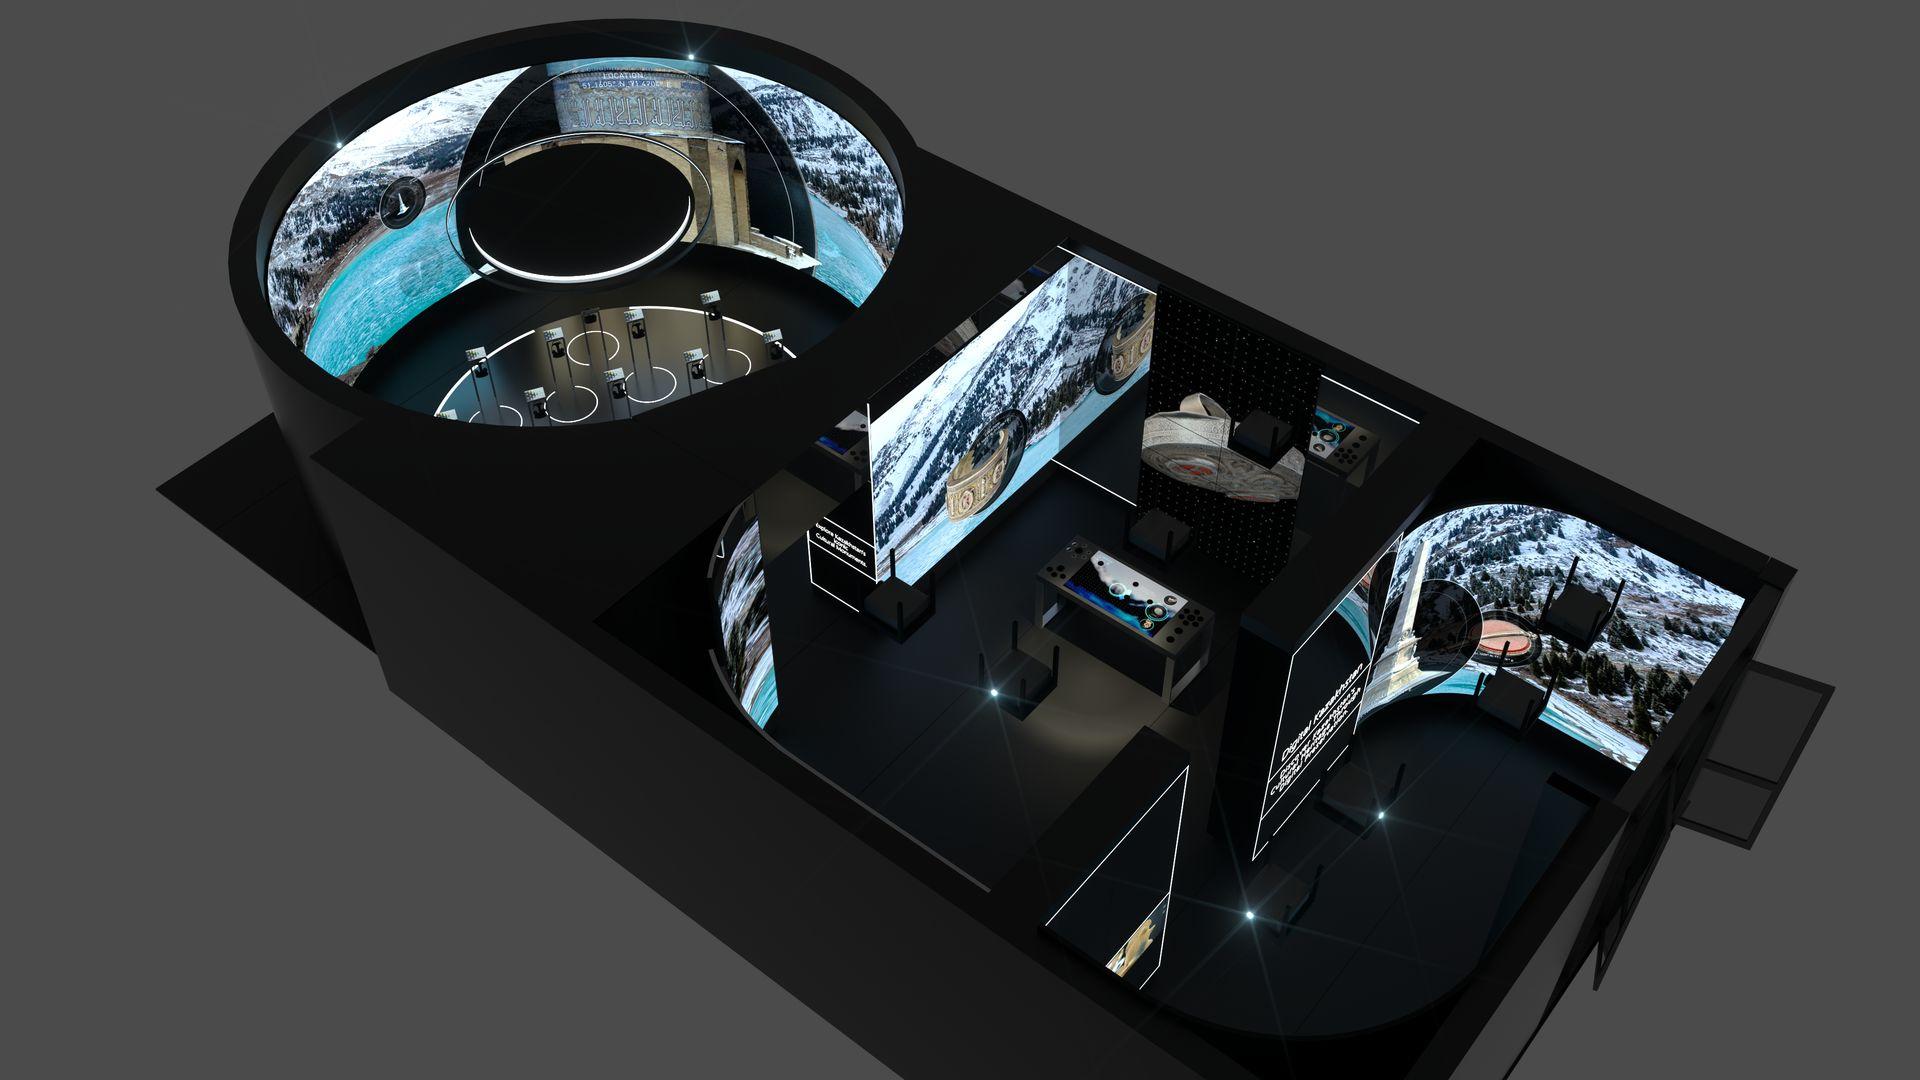 VR AR space